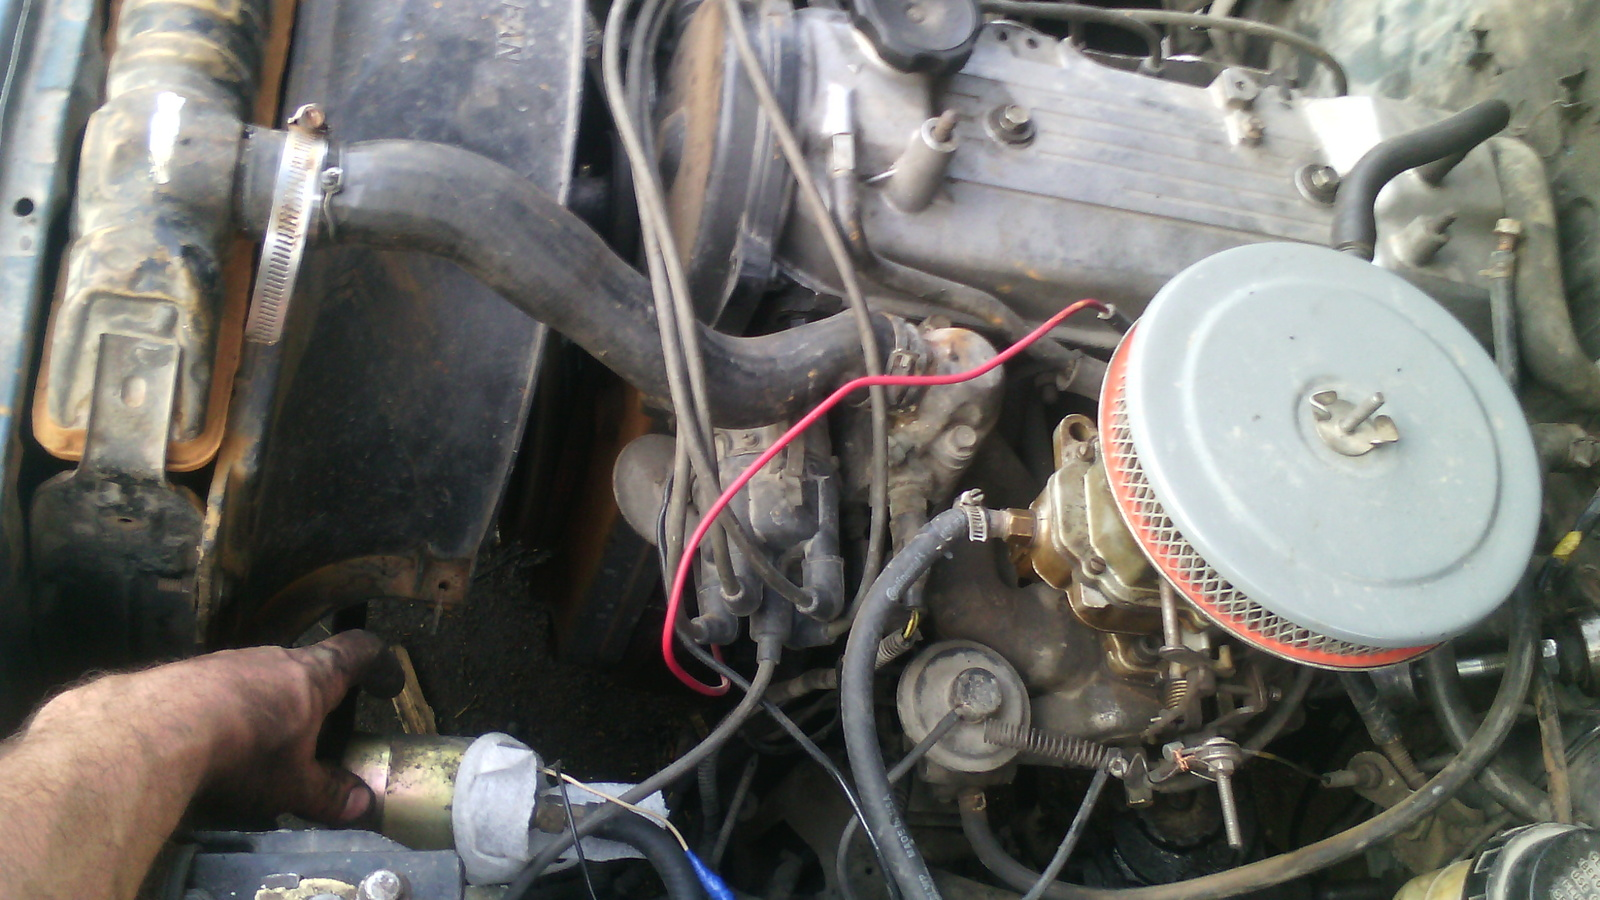 1987 Dodge Ram 50 Fuel Filter Location Wiring Diagrams Data Base 2004 1500 V6 Pickup Questions Donde Esta La Bomba De Gasolina Rh Cargurus Com On 2500 For Frente Del Motor Enseguida